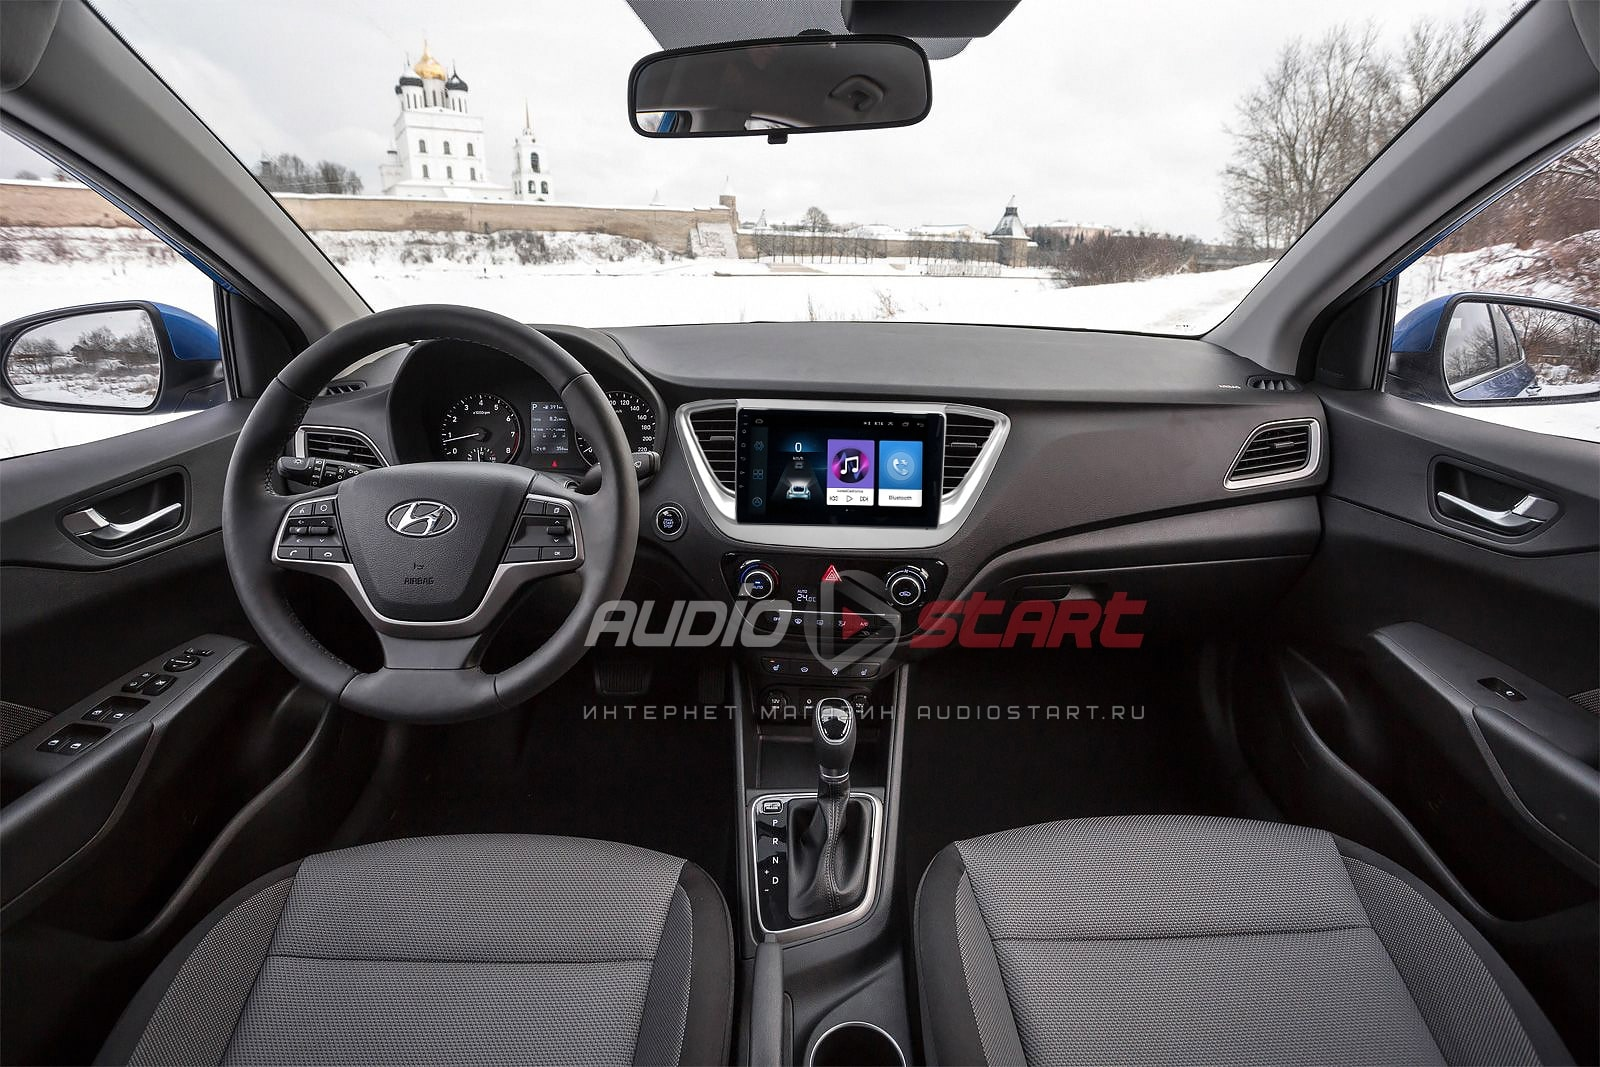 https://audiostart.ru/images/upload/Hyundai%20Solaris%20784-min.jpg